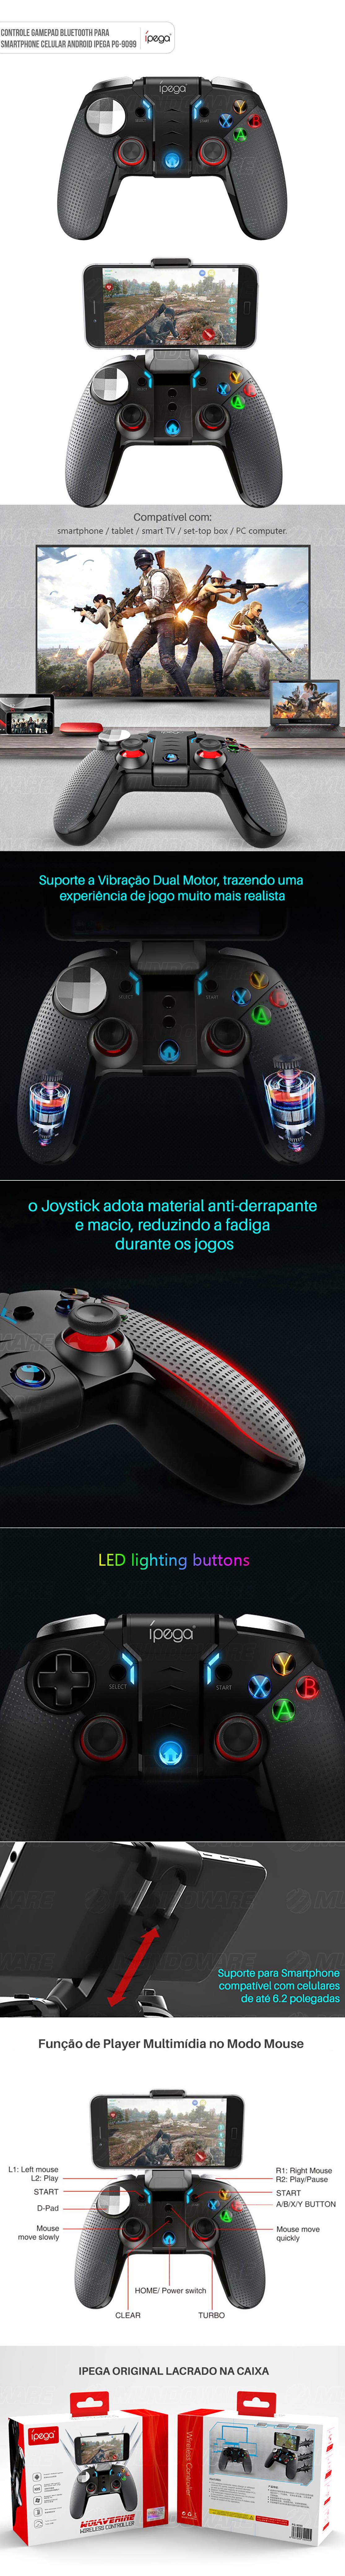 Ipega Wolverine PG-9099 Original Dual Motor Turbo Controle Gamepad Bluetooth para Celular Windows Android